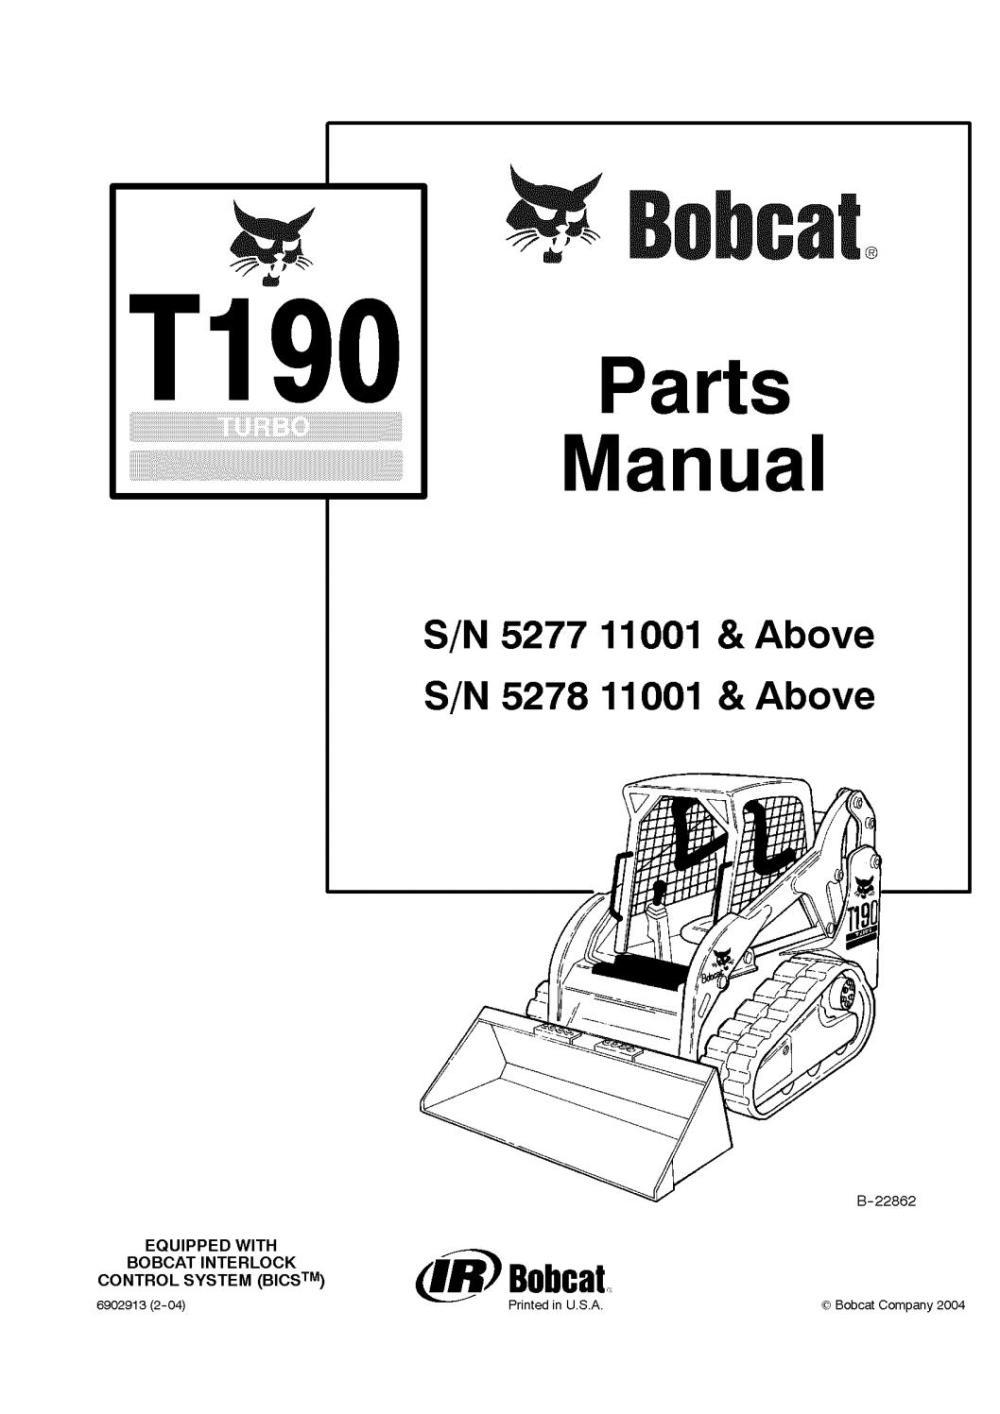 medium resolution of bobcat t190 schematic wiring diagram autovehiclebobcat t190 schematic wiring diagram mega2013 bobcat t190 wiring diagram wiring